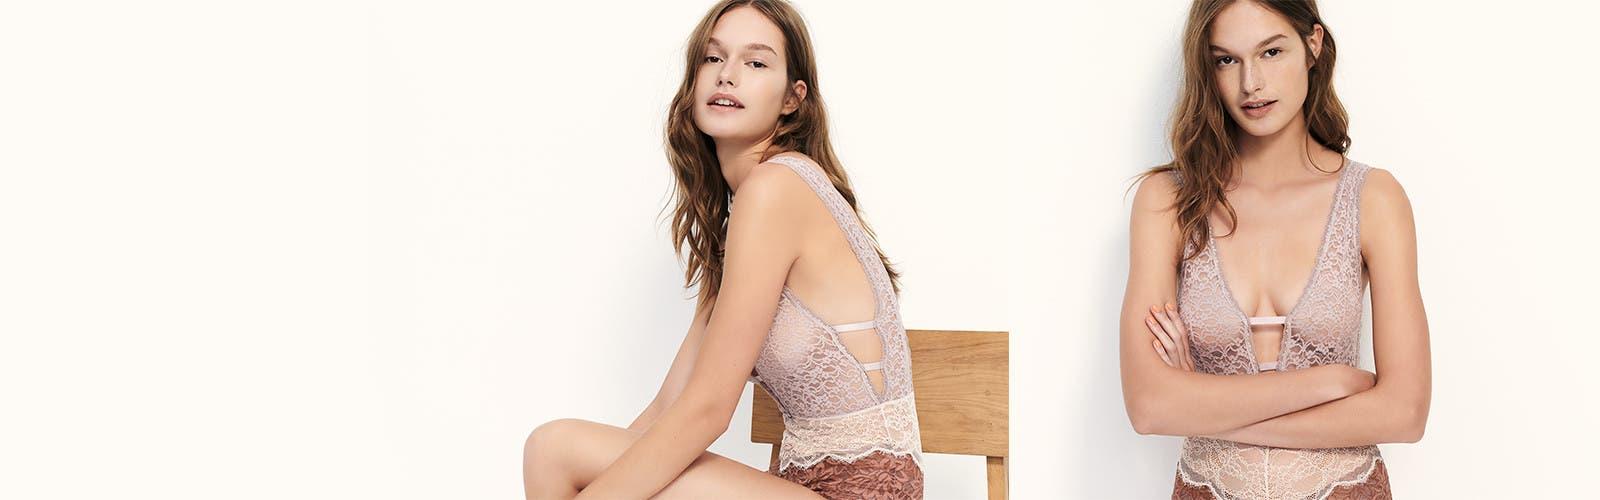 Sexy surprises: women's lingerie, bras and panties.